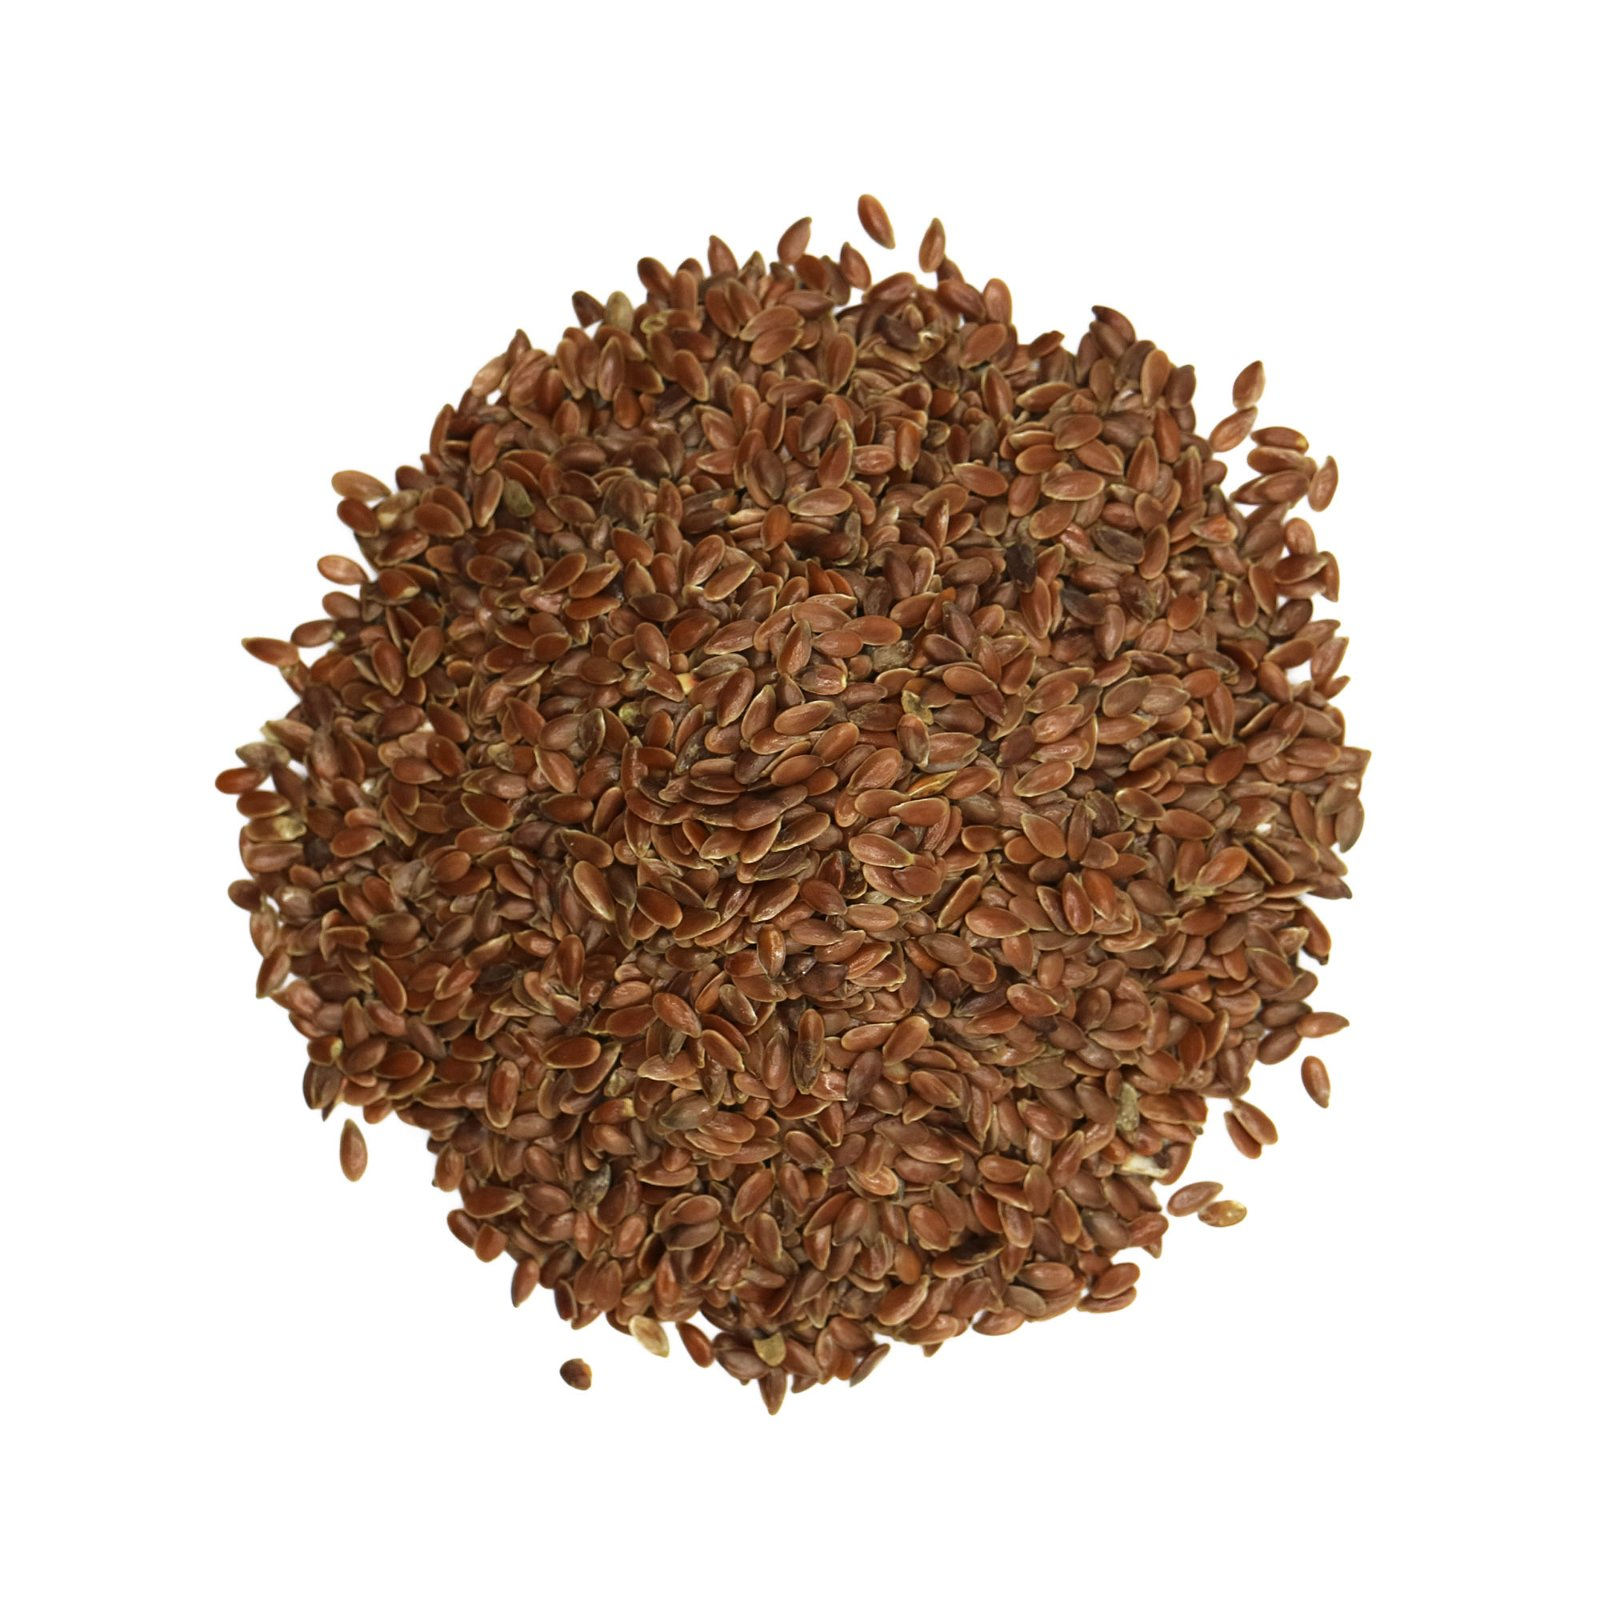 img-la-fourche-500g-de-graines-de-lin-brun-bio-en-vrac